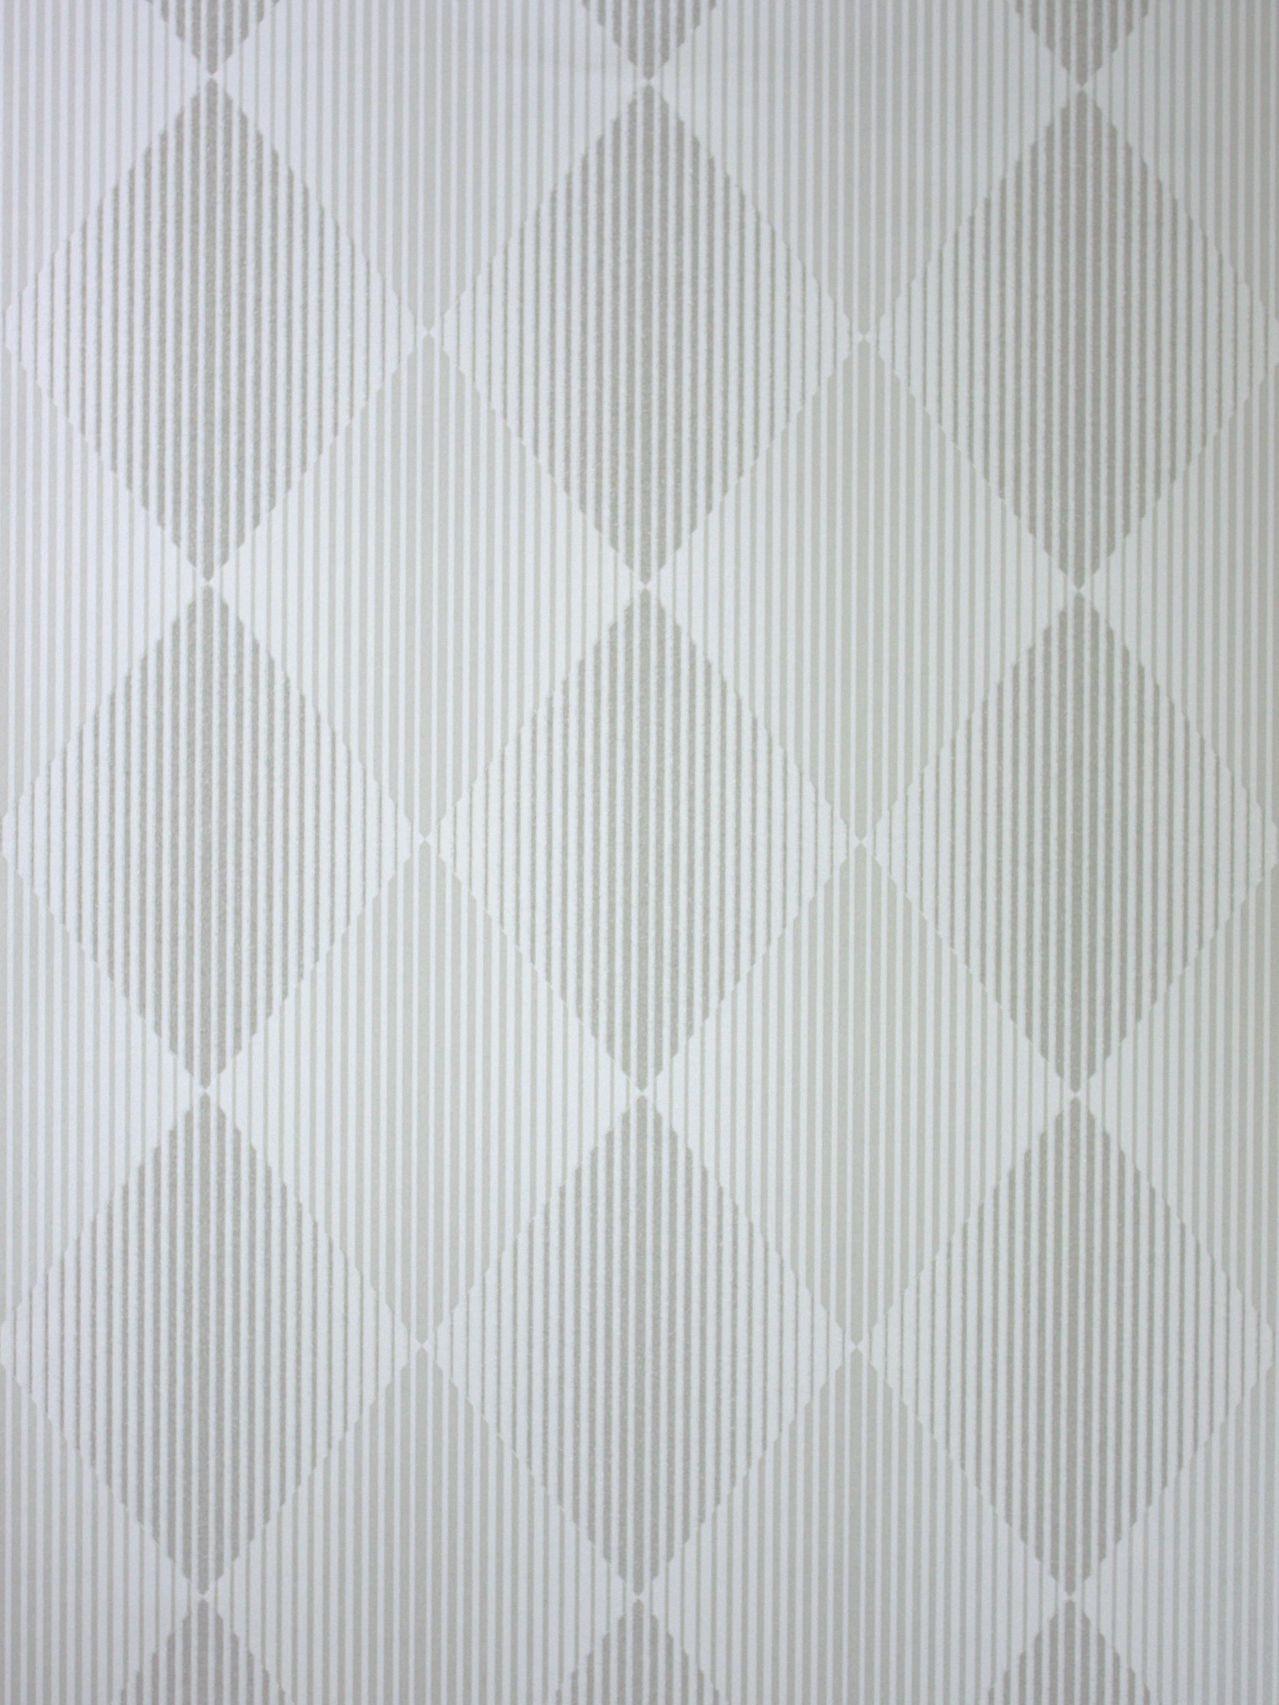 Osborne & Little Osborne & Little Pave Wallpaper